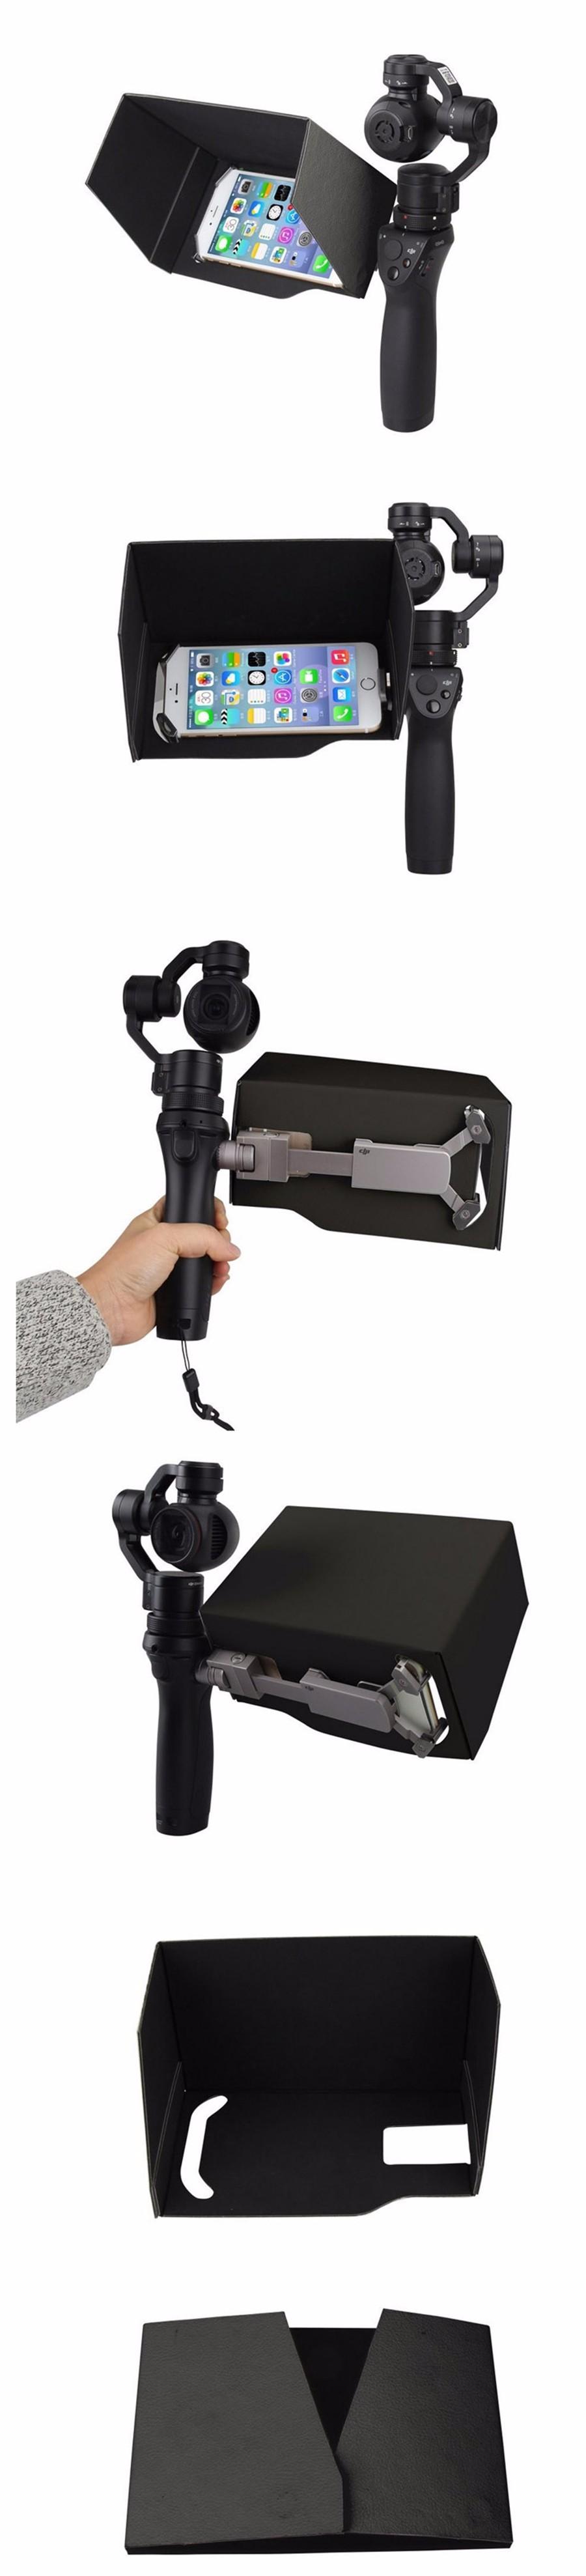 SunShade Hood for DJI Osmo 5.5 Inch Cellphone Phone Smartphone SunHood Monitor Shade DJI OSMO Accessories